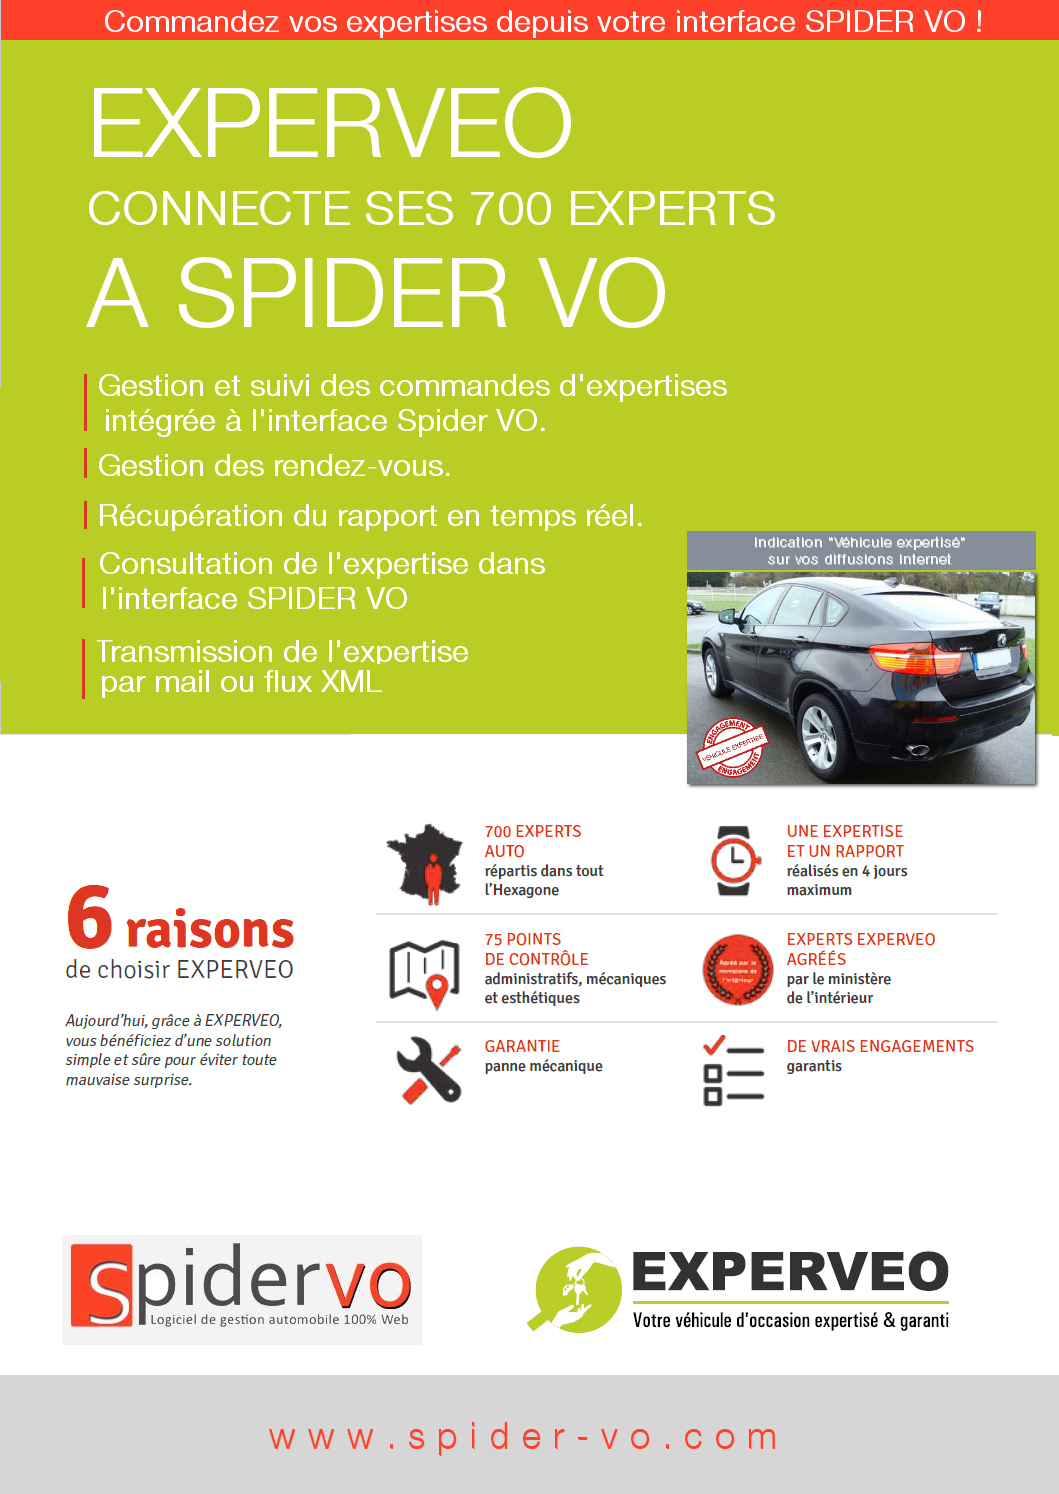 EXPERVEO connecte ses 700 experts à SPIDER VO ! 1